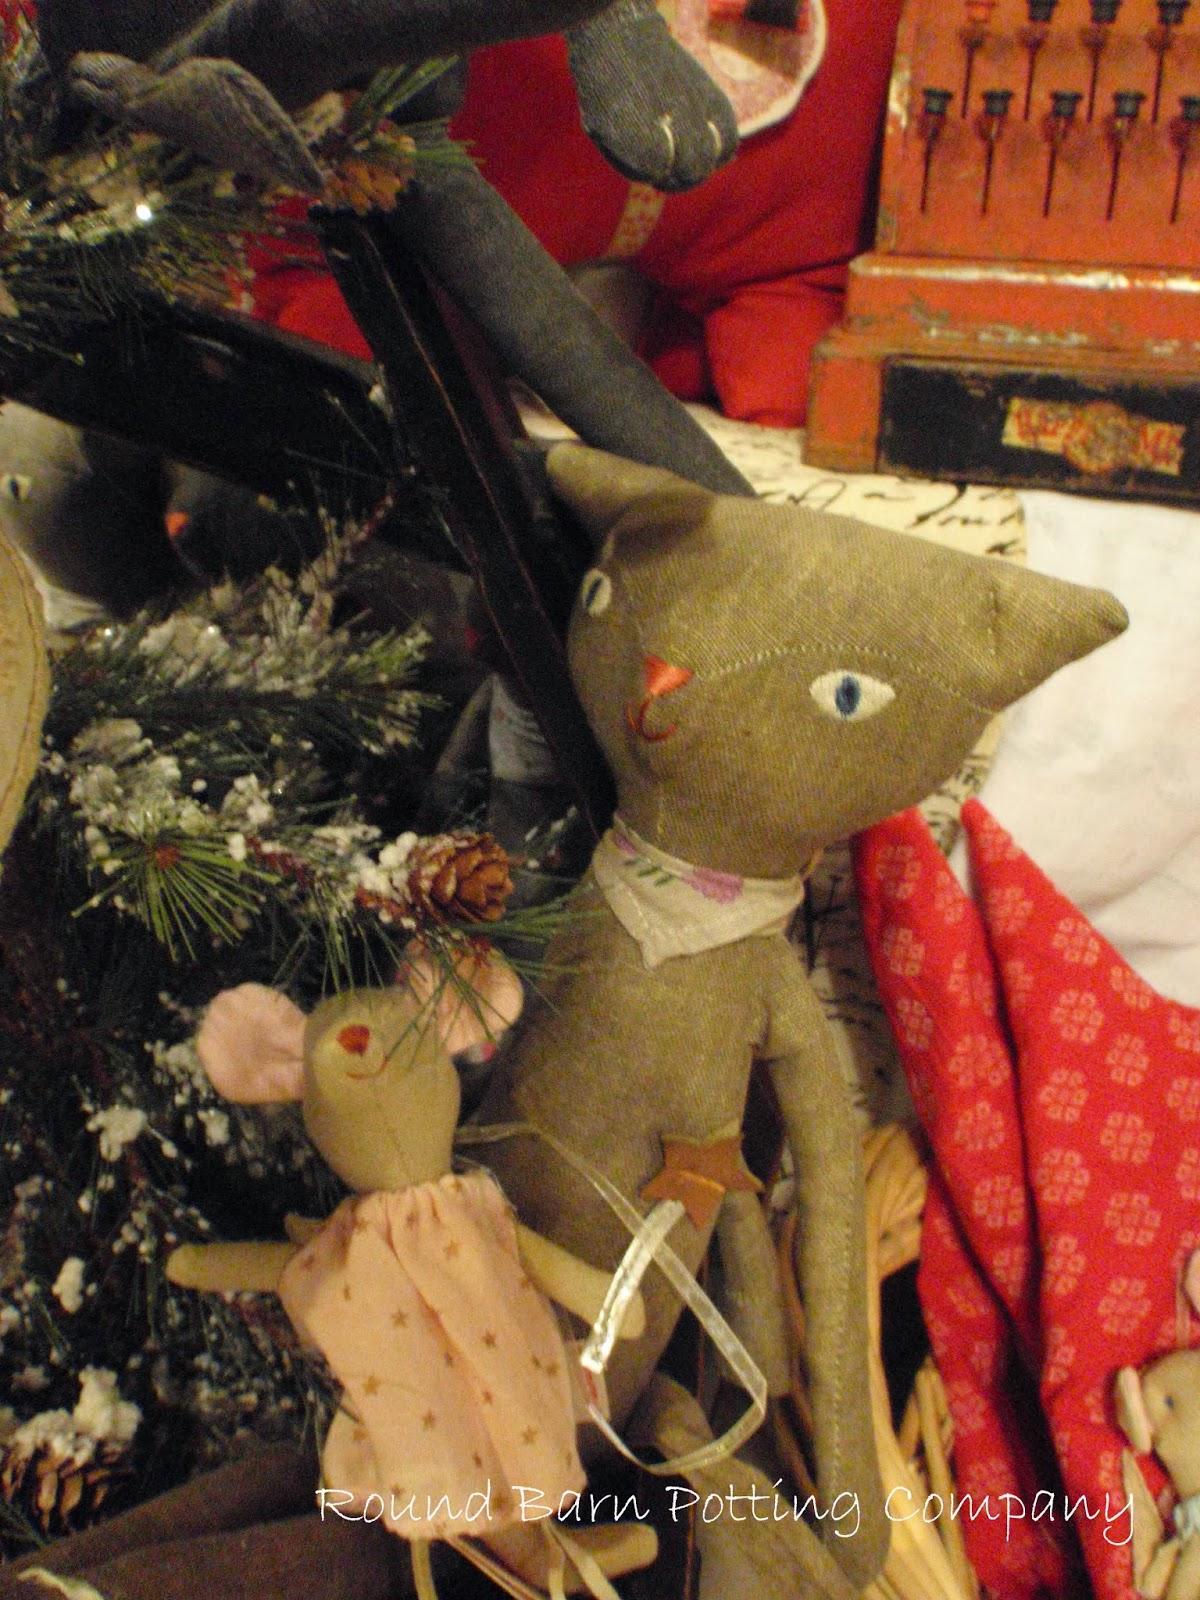 Lori Miller S Round Barn Potting Company My Danish Lovelies